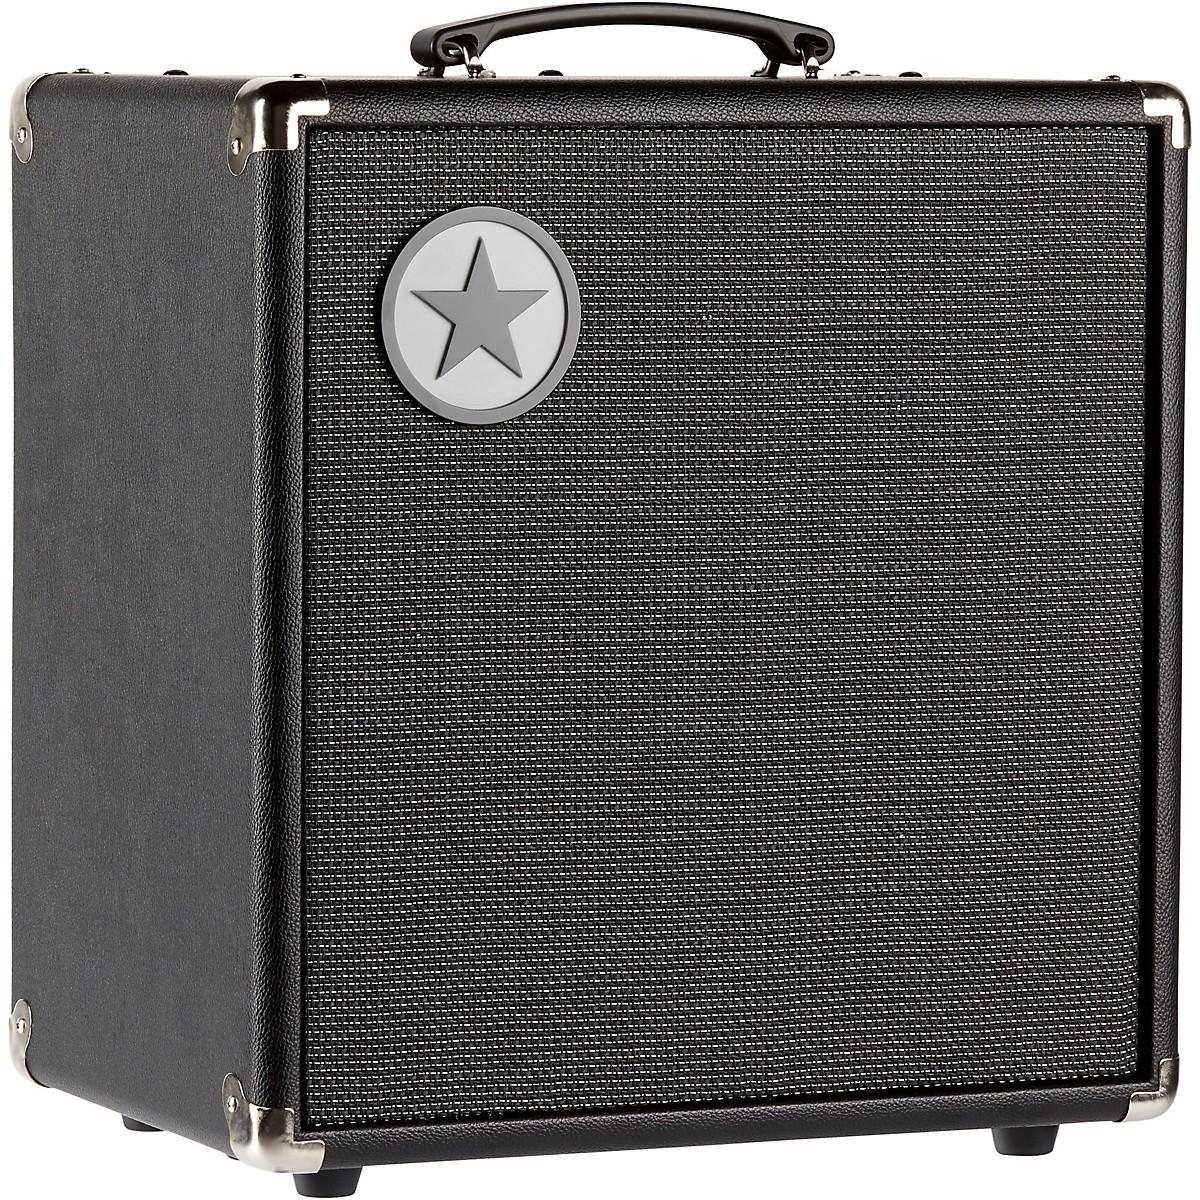 Blackstar Unity BASSU60 60W 1x10 Bass Combo Amplifier